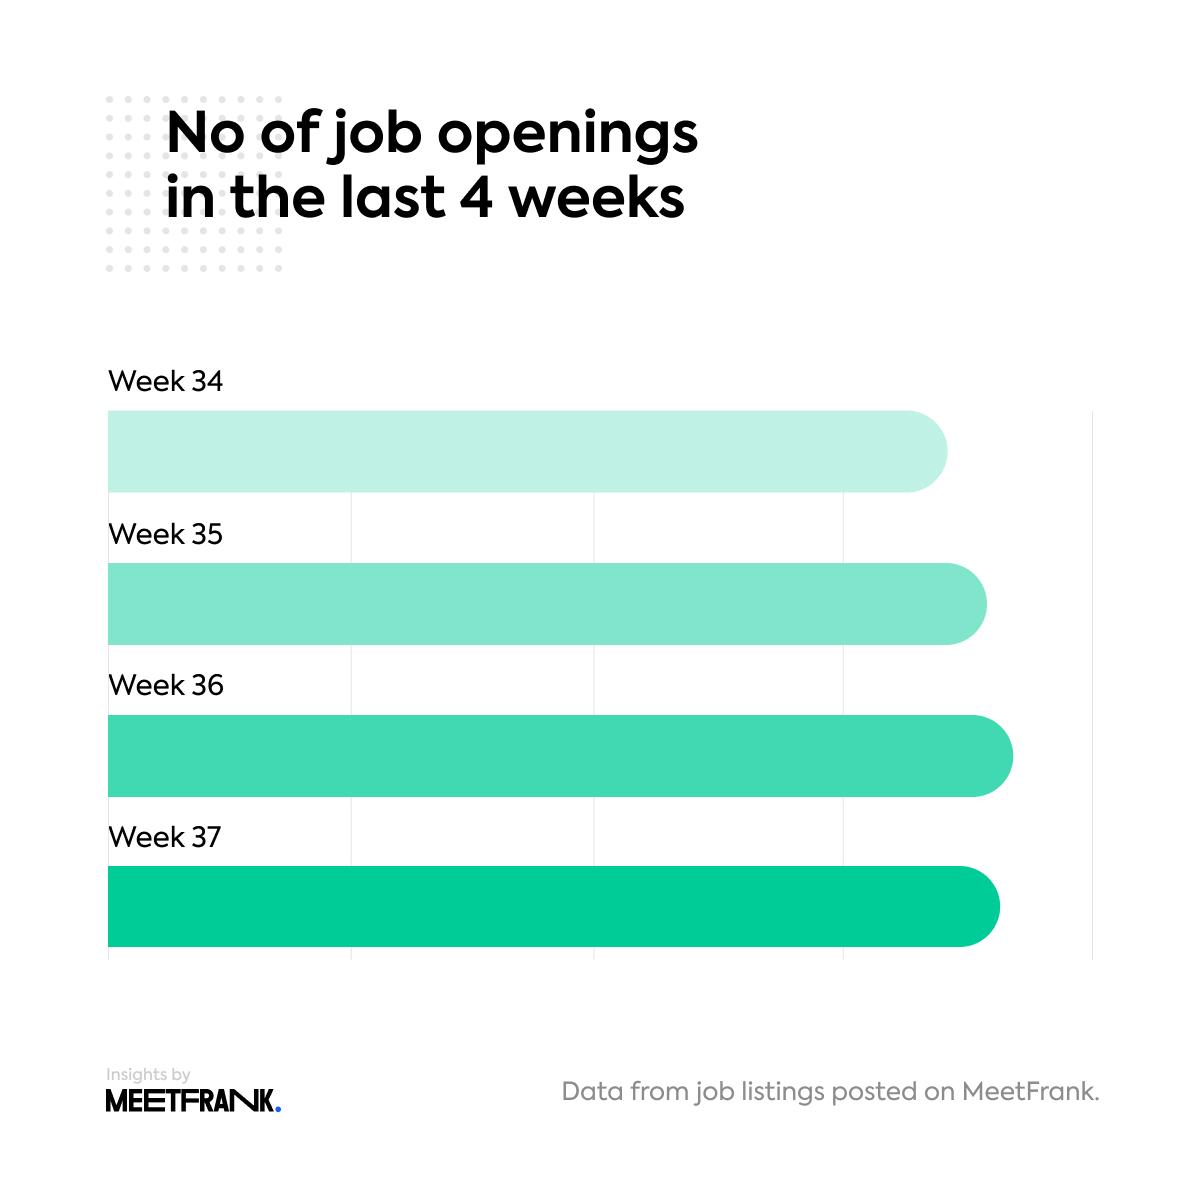 openings in the global job market